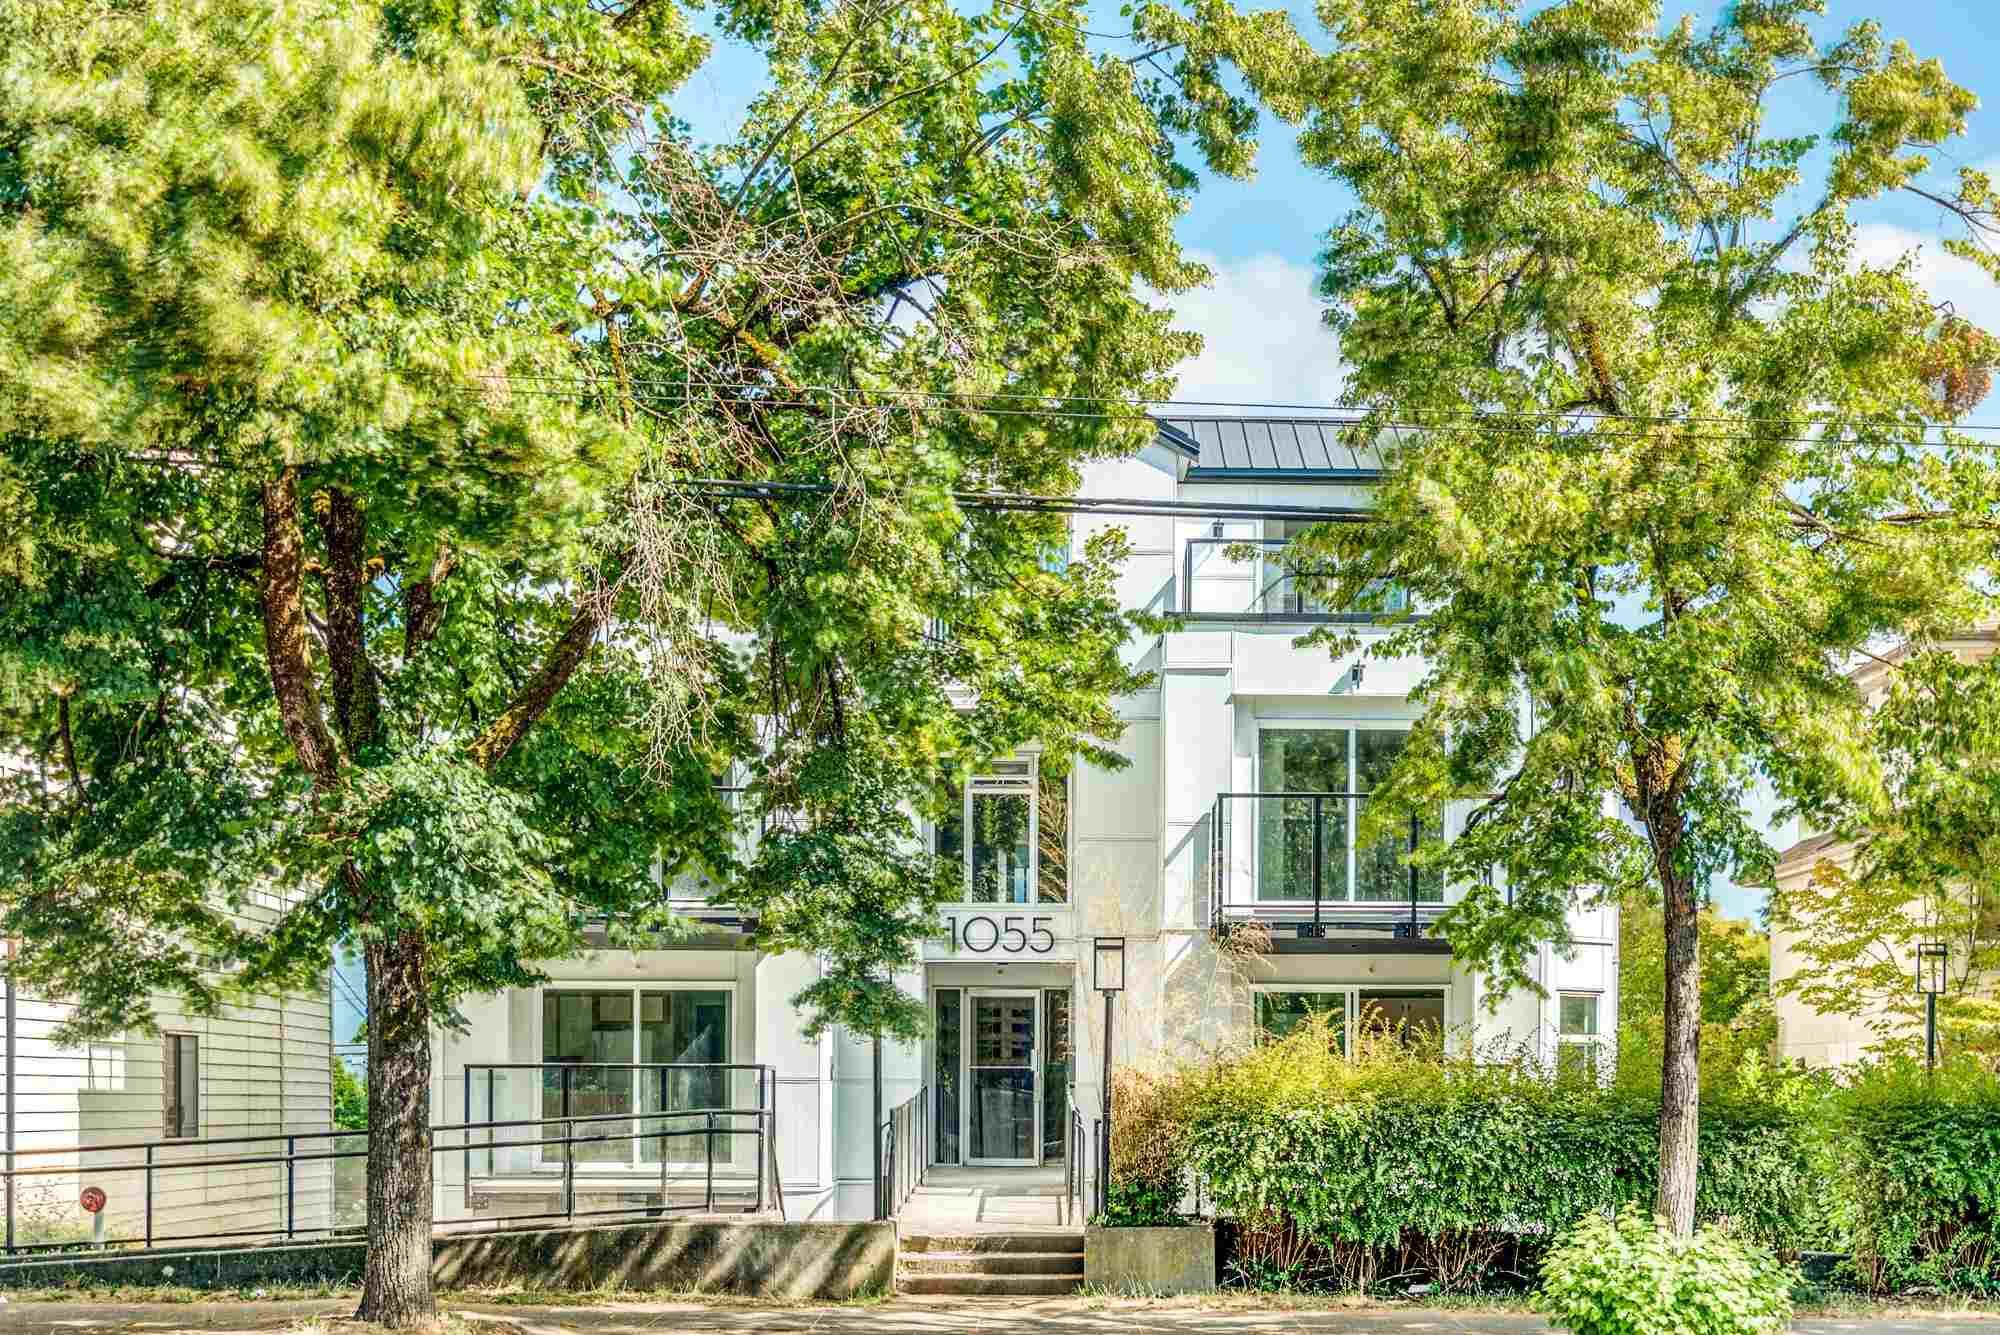 302 1055 E BROADWAY - Mount Pleasant VE Apartment/Condo for sale, 1 Bedroom (R2628387) - #1